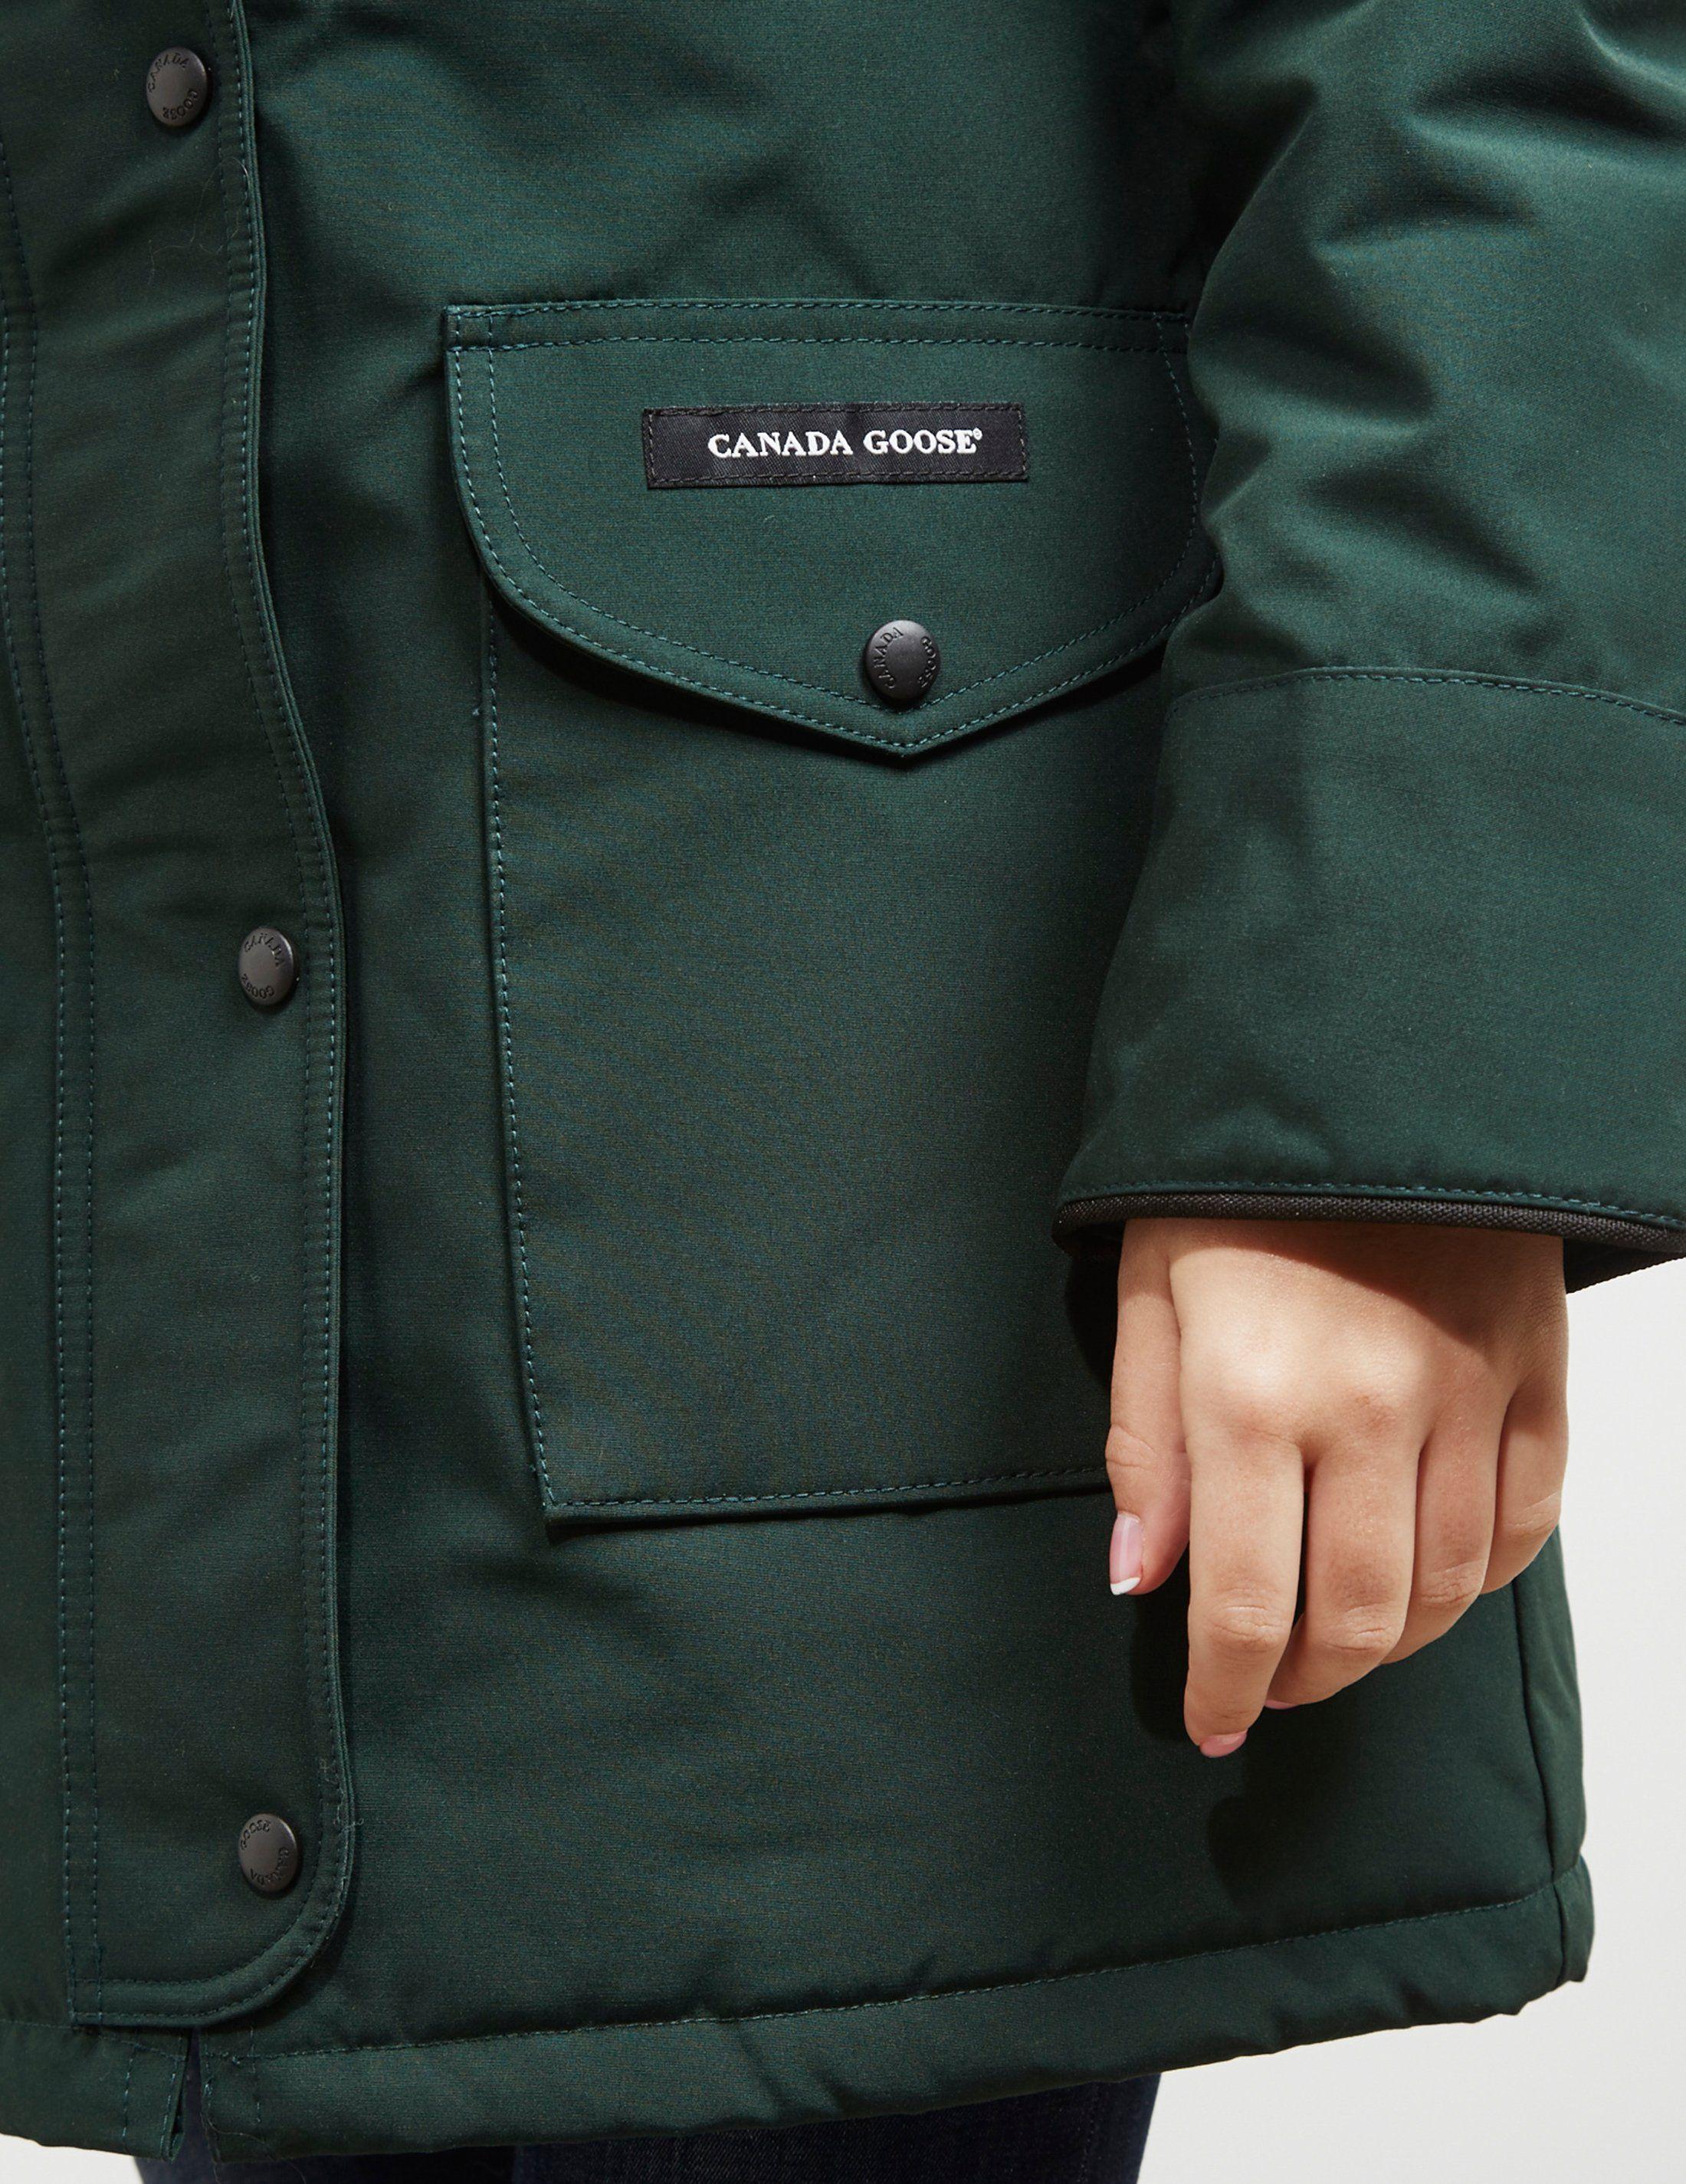 Canada Goose Trillium Padded Parka Jacket